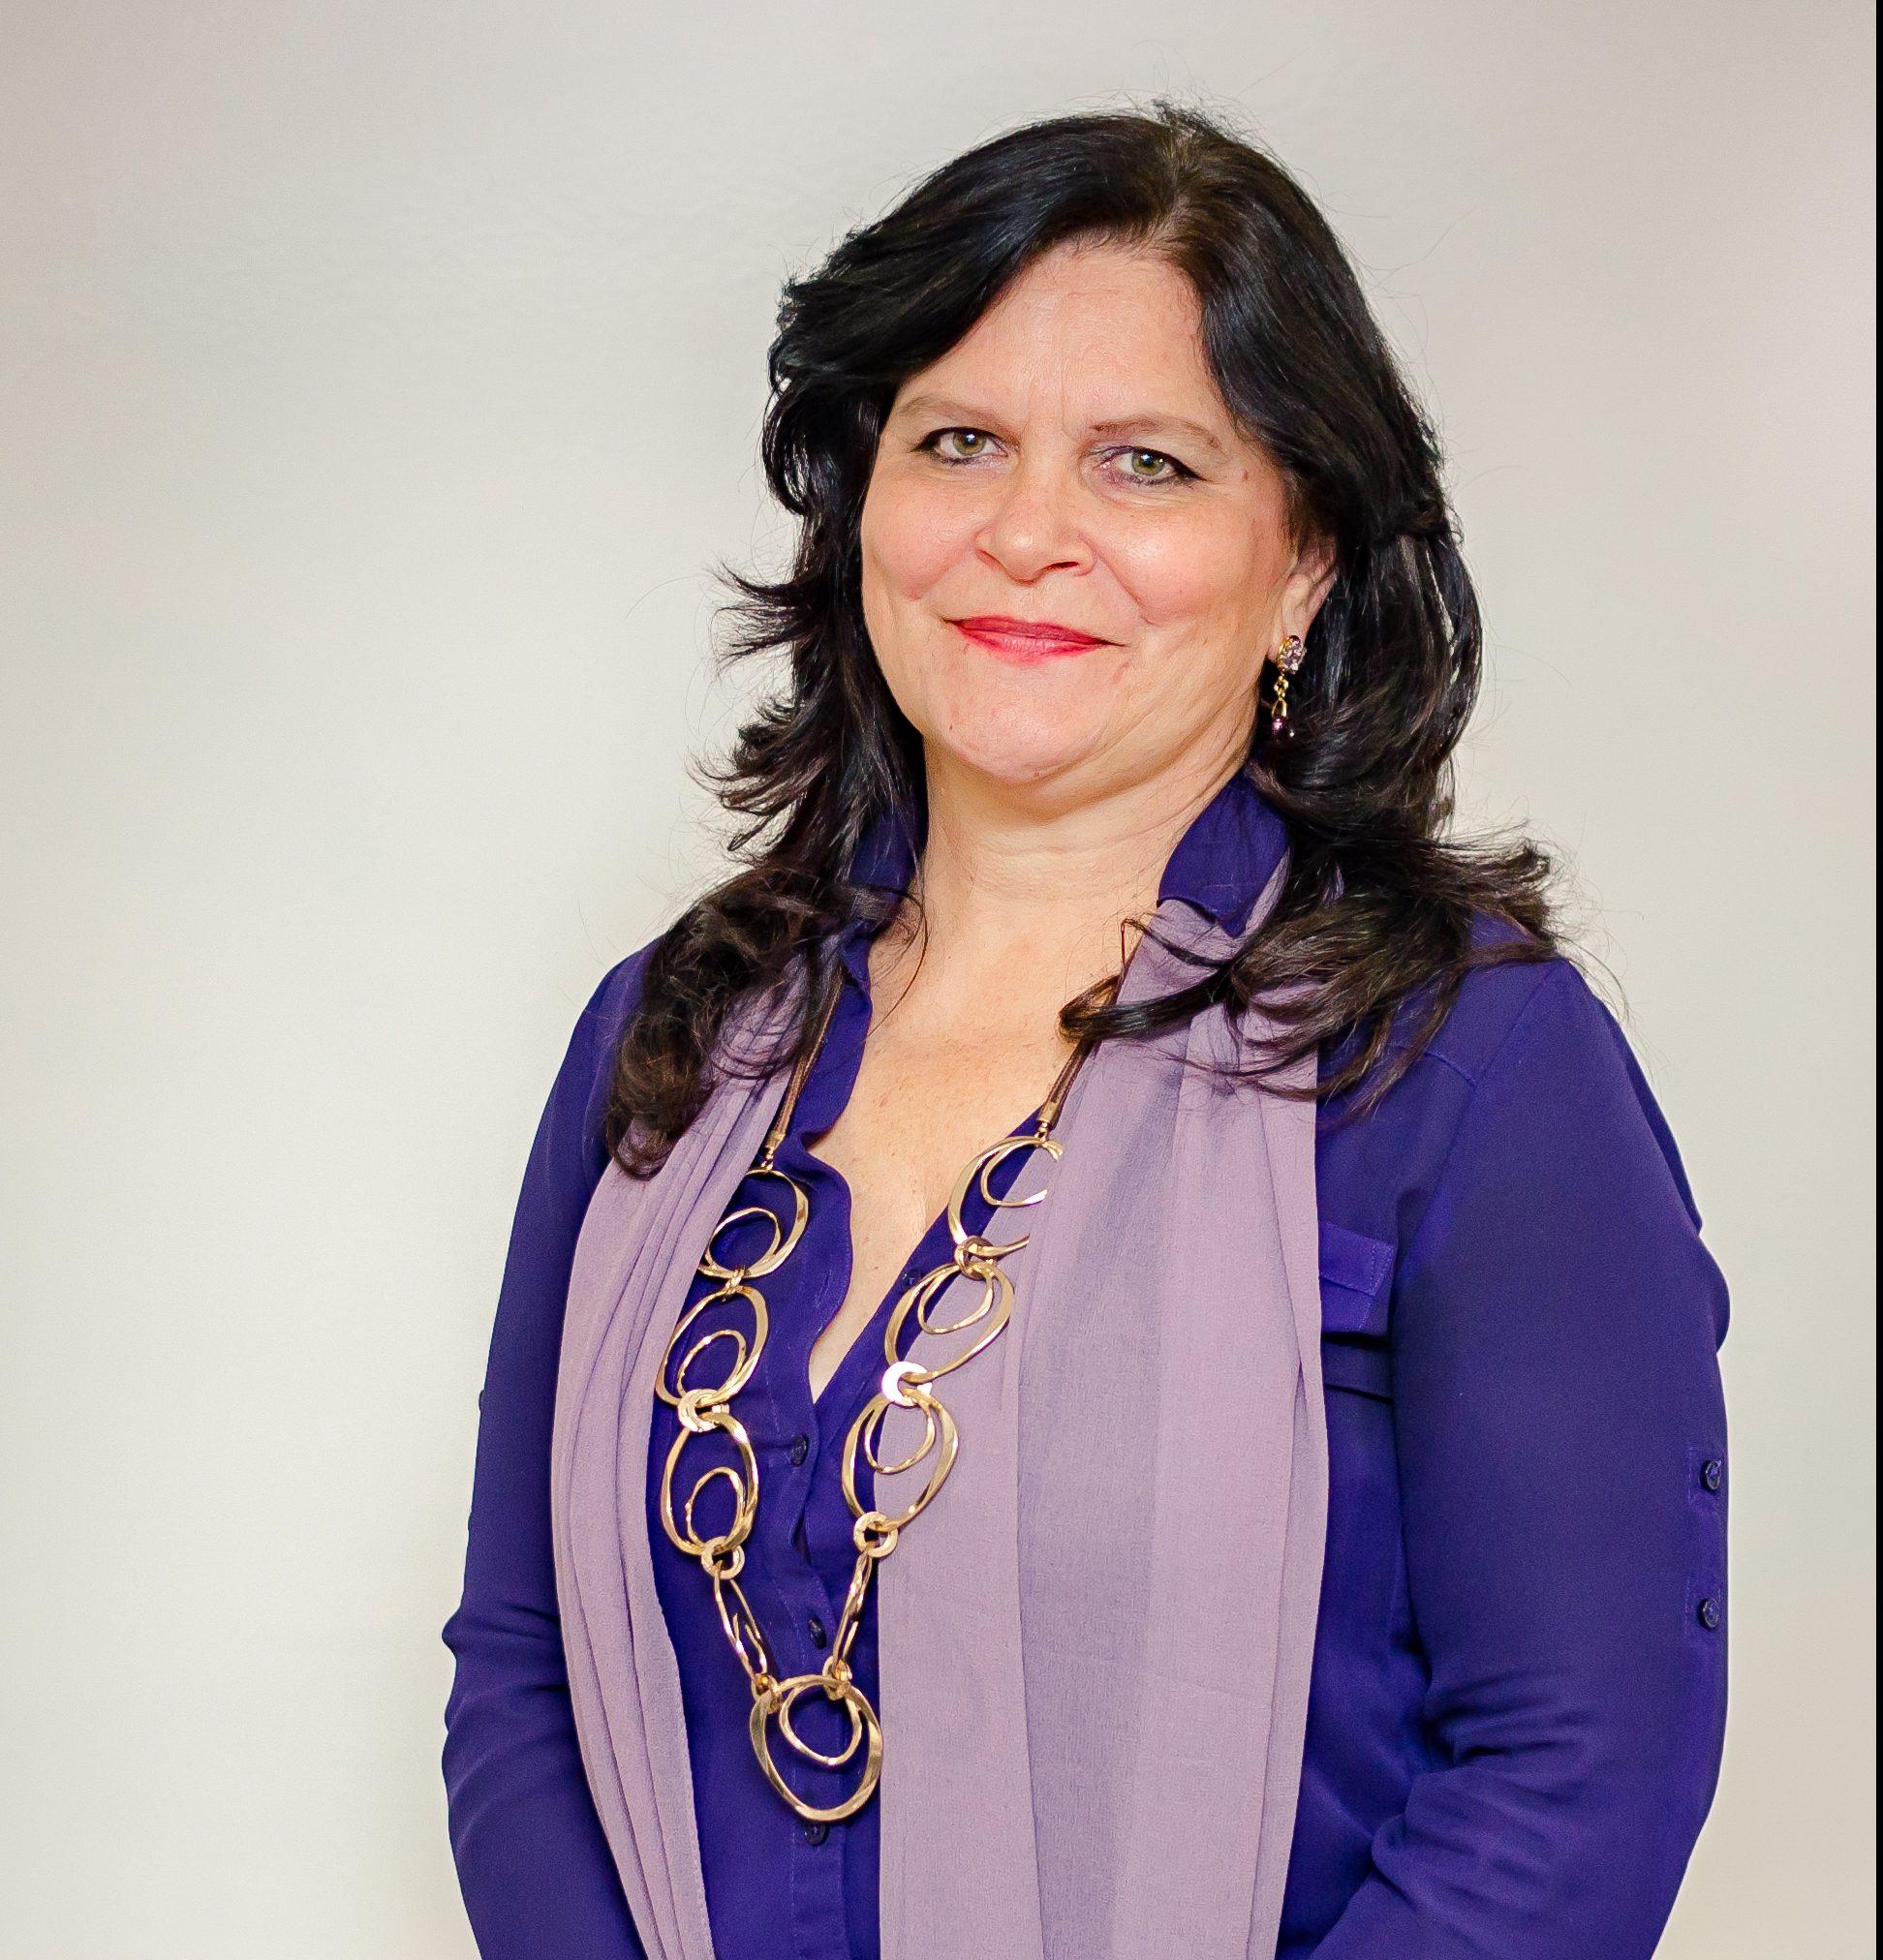 MSc María Isabel Borjes Montealegre